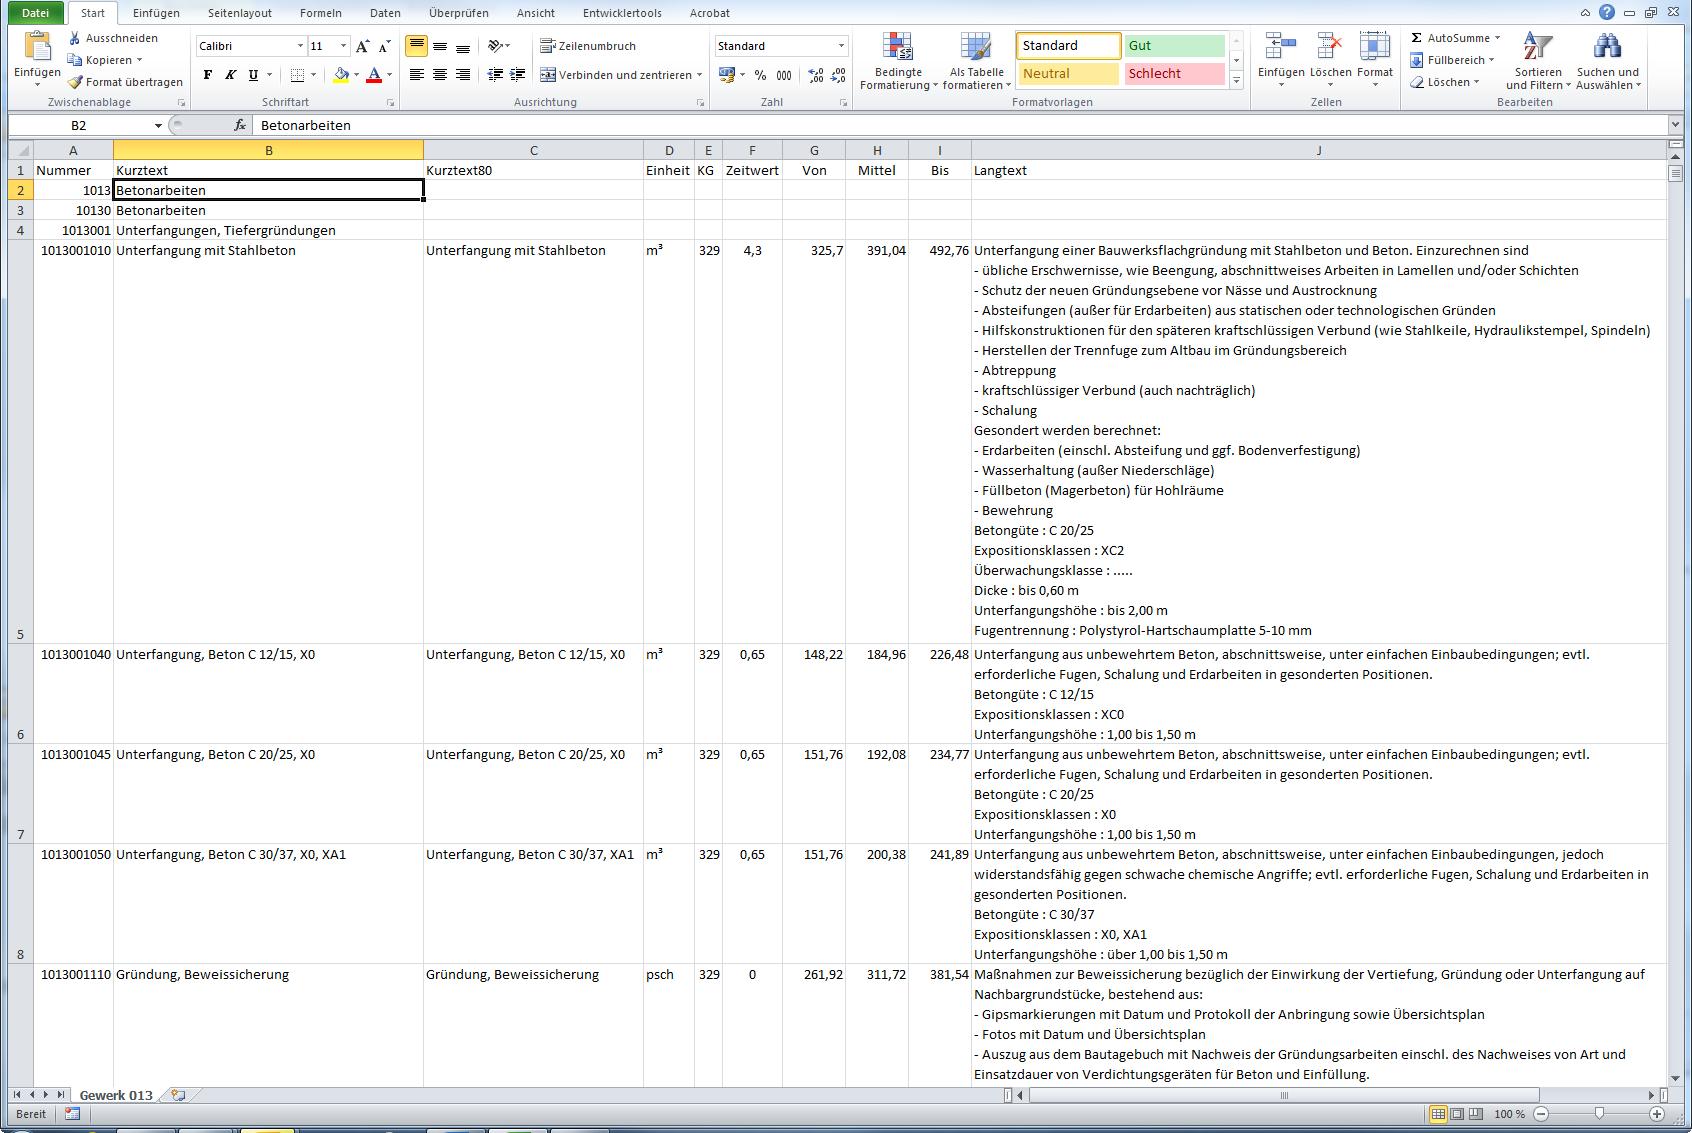 Datenausgabe CSV